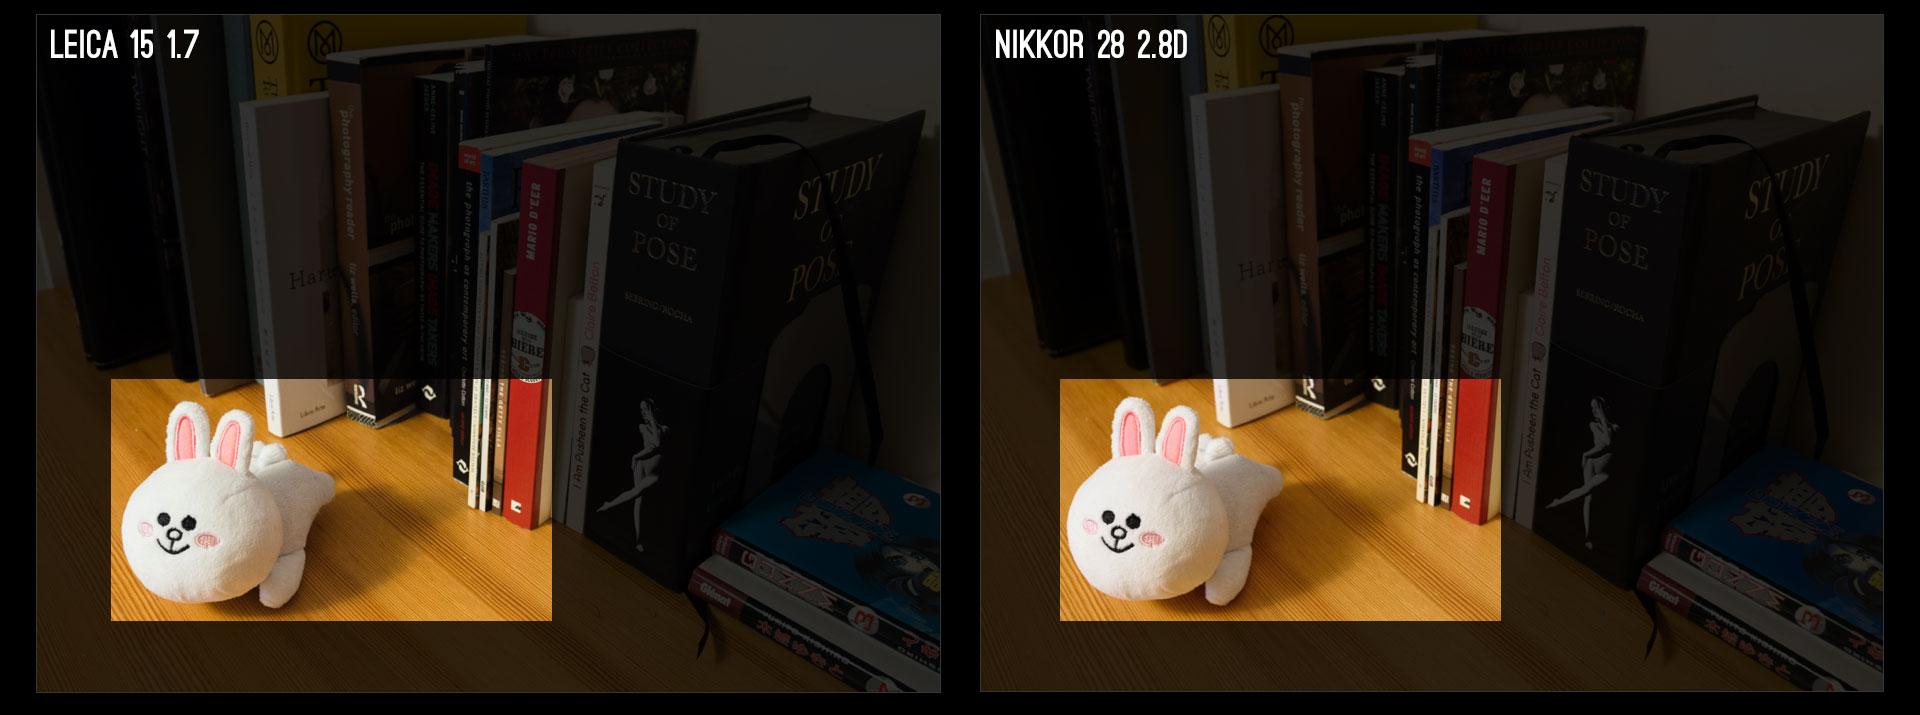 lumix-vs-nikkor-28-2.jpg